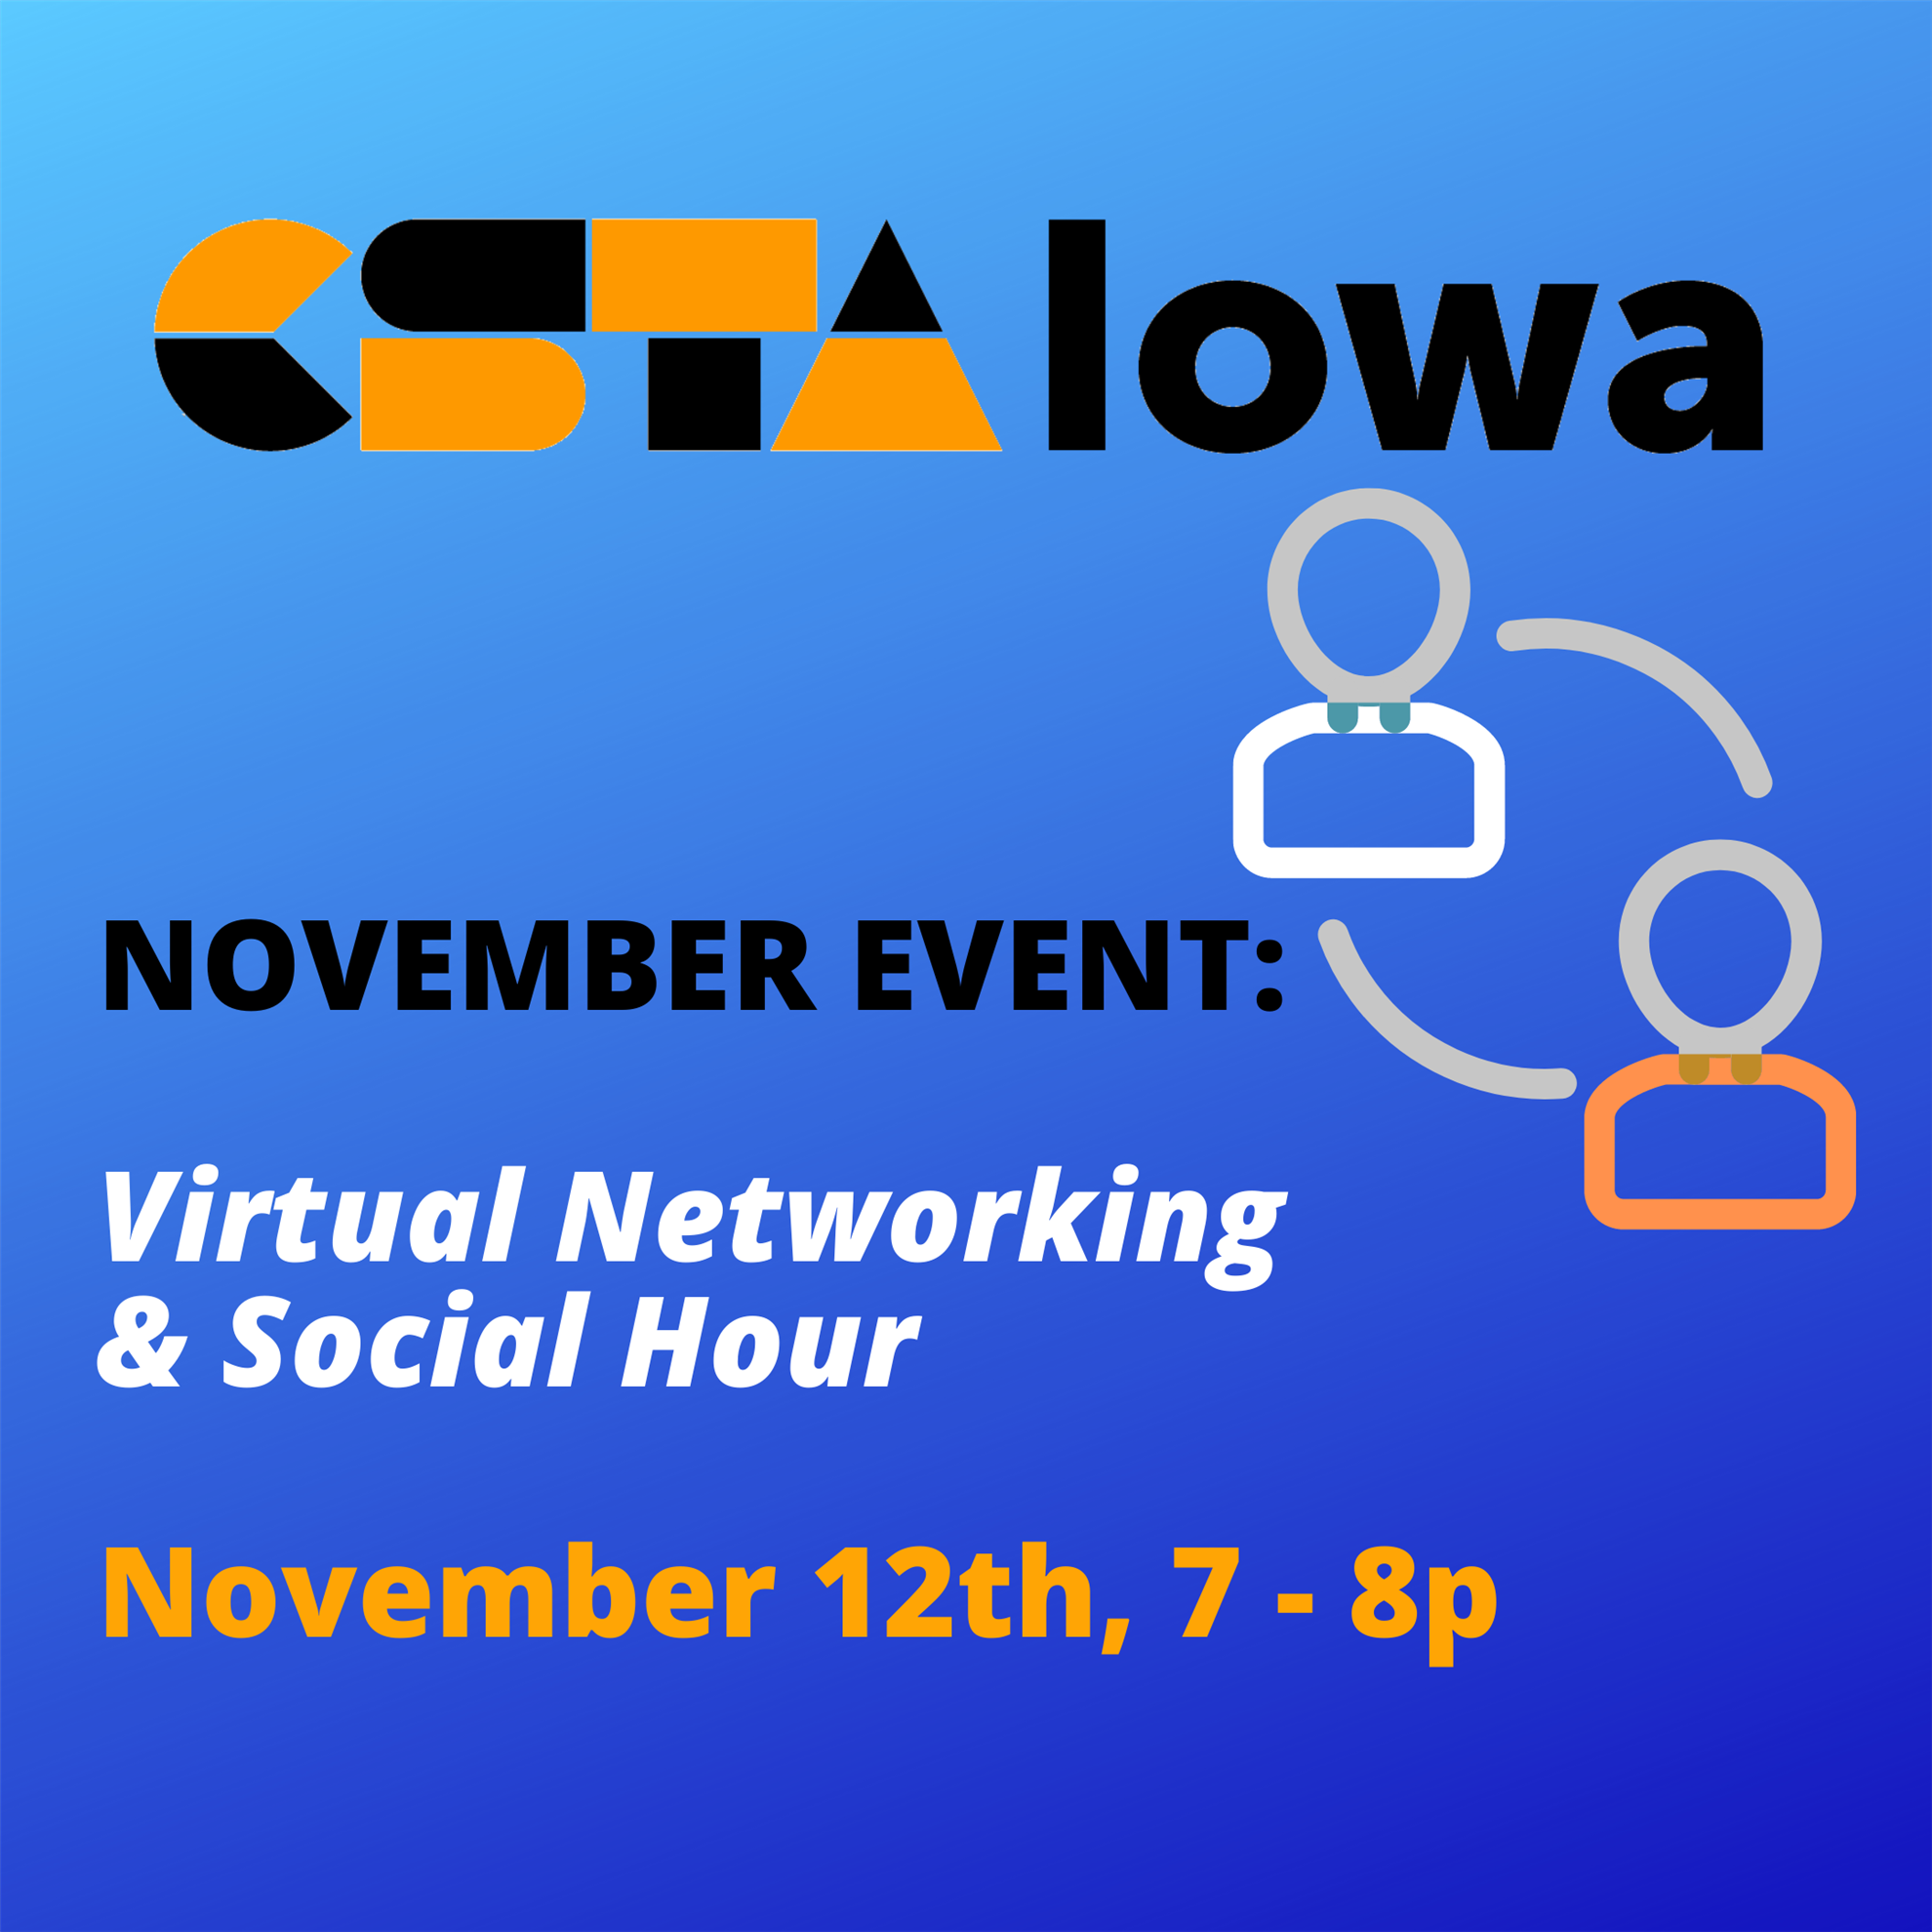 CSTA Iowa November 2020 Virtual Networking & Social Hour (CSTA Iowa)